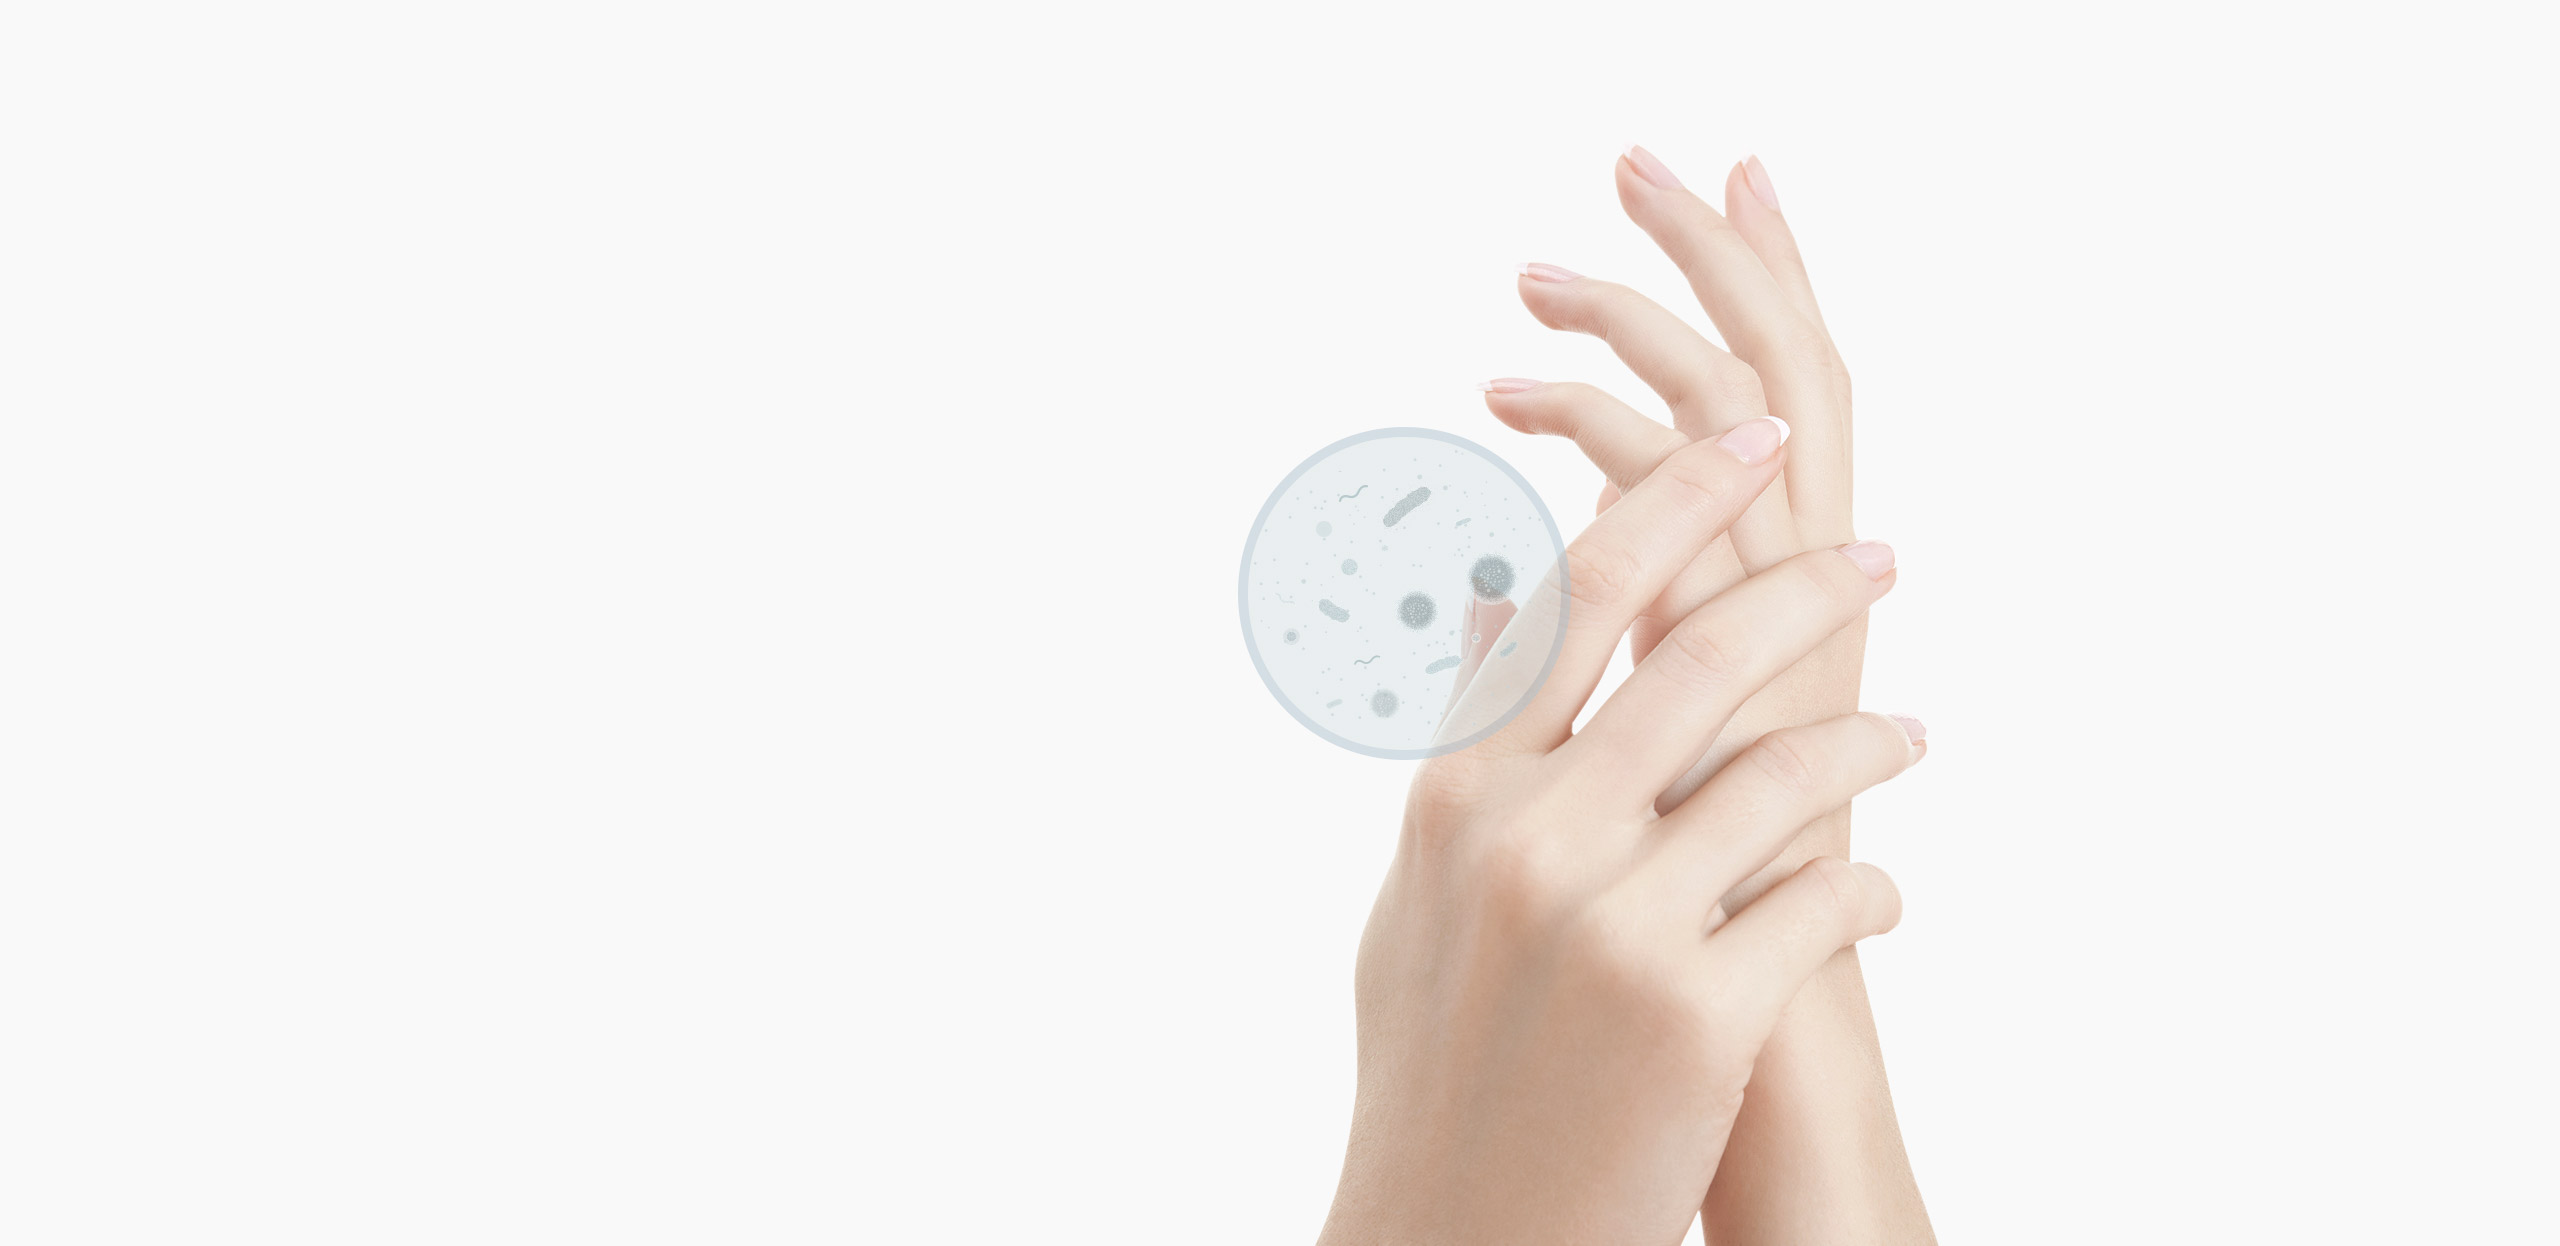 Дозатор Xiaomi Mijia SimpleWay Automatic Foam Soap Dispenser 3